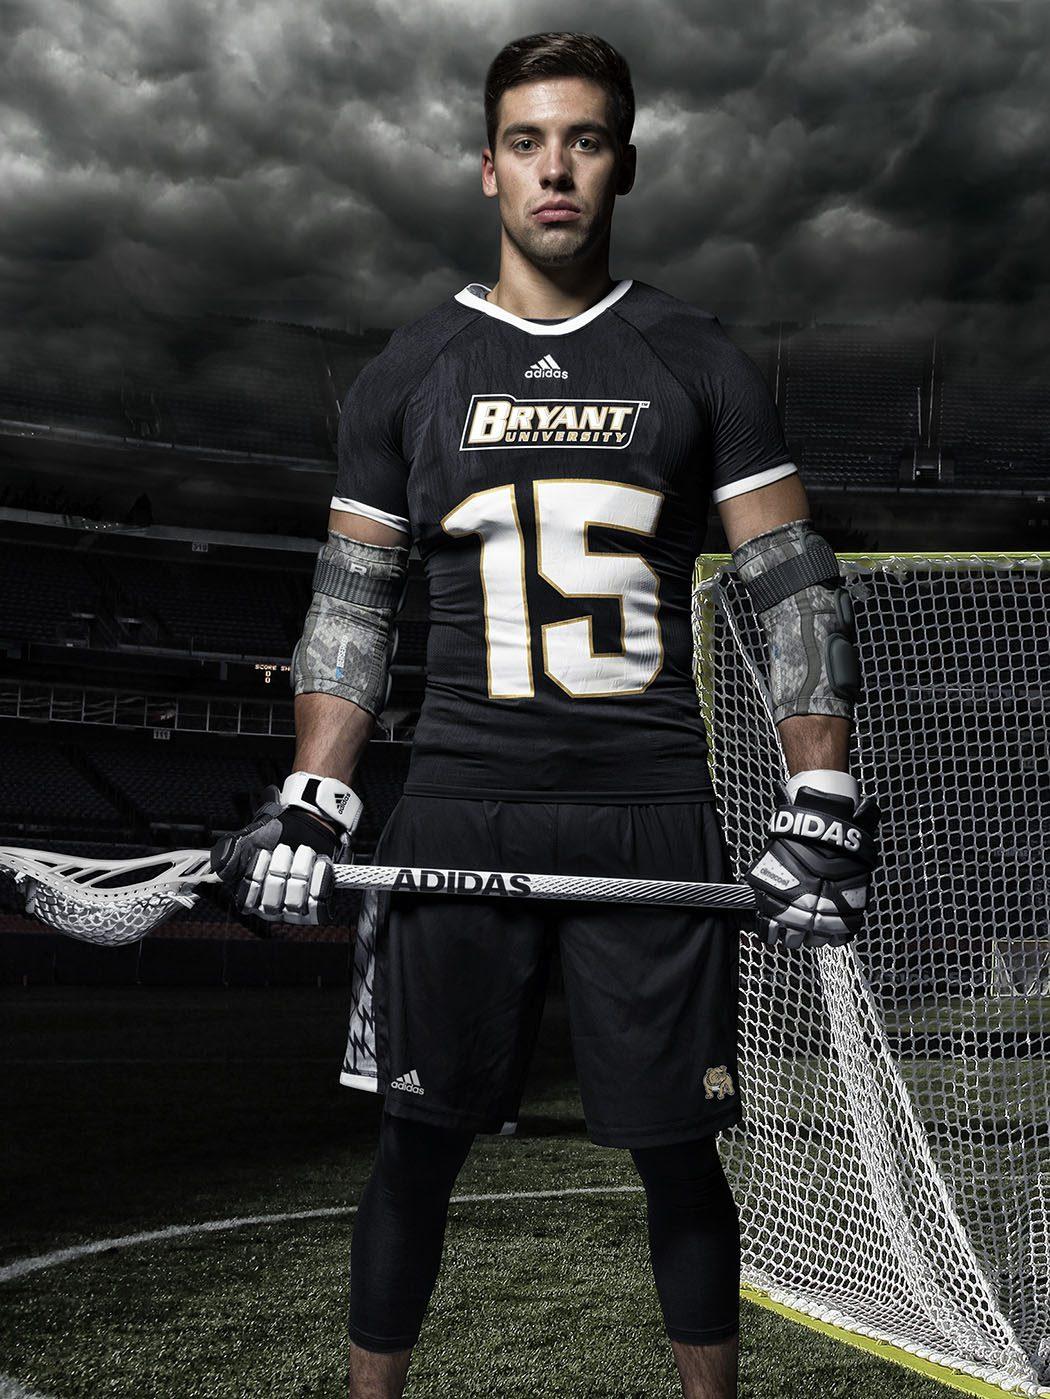 Bryant x adidas Lacrosse Primeknit Jersey & Uniform